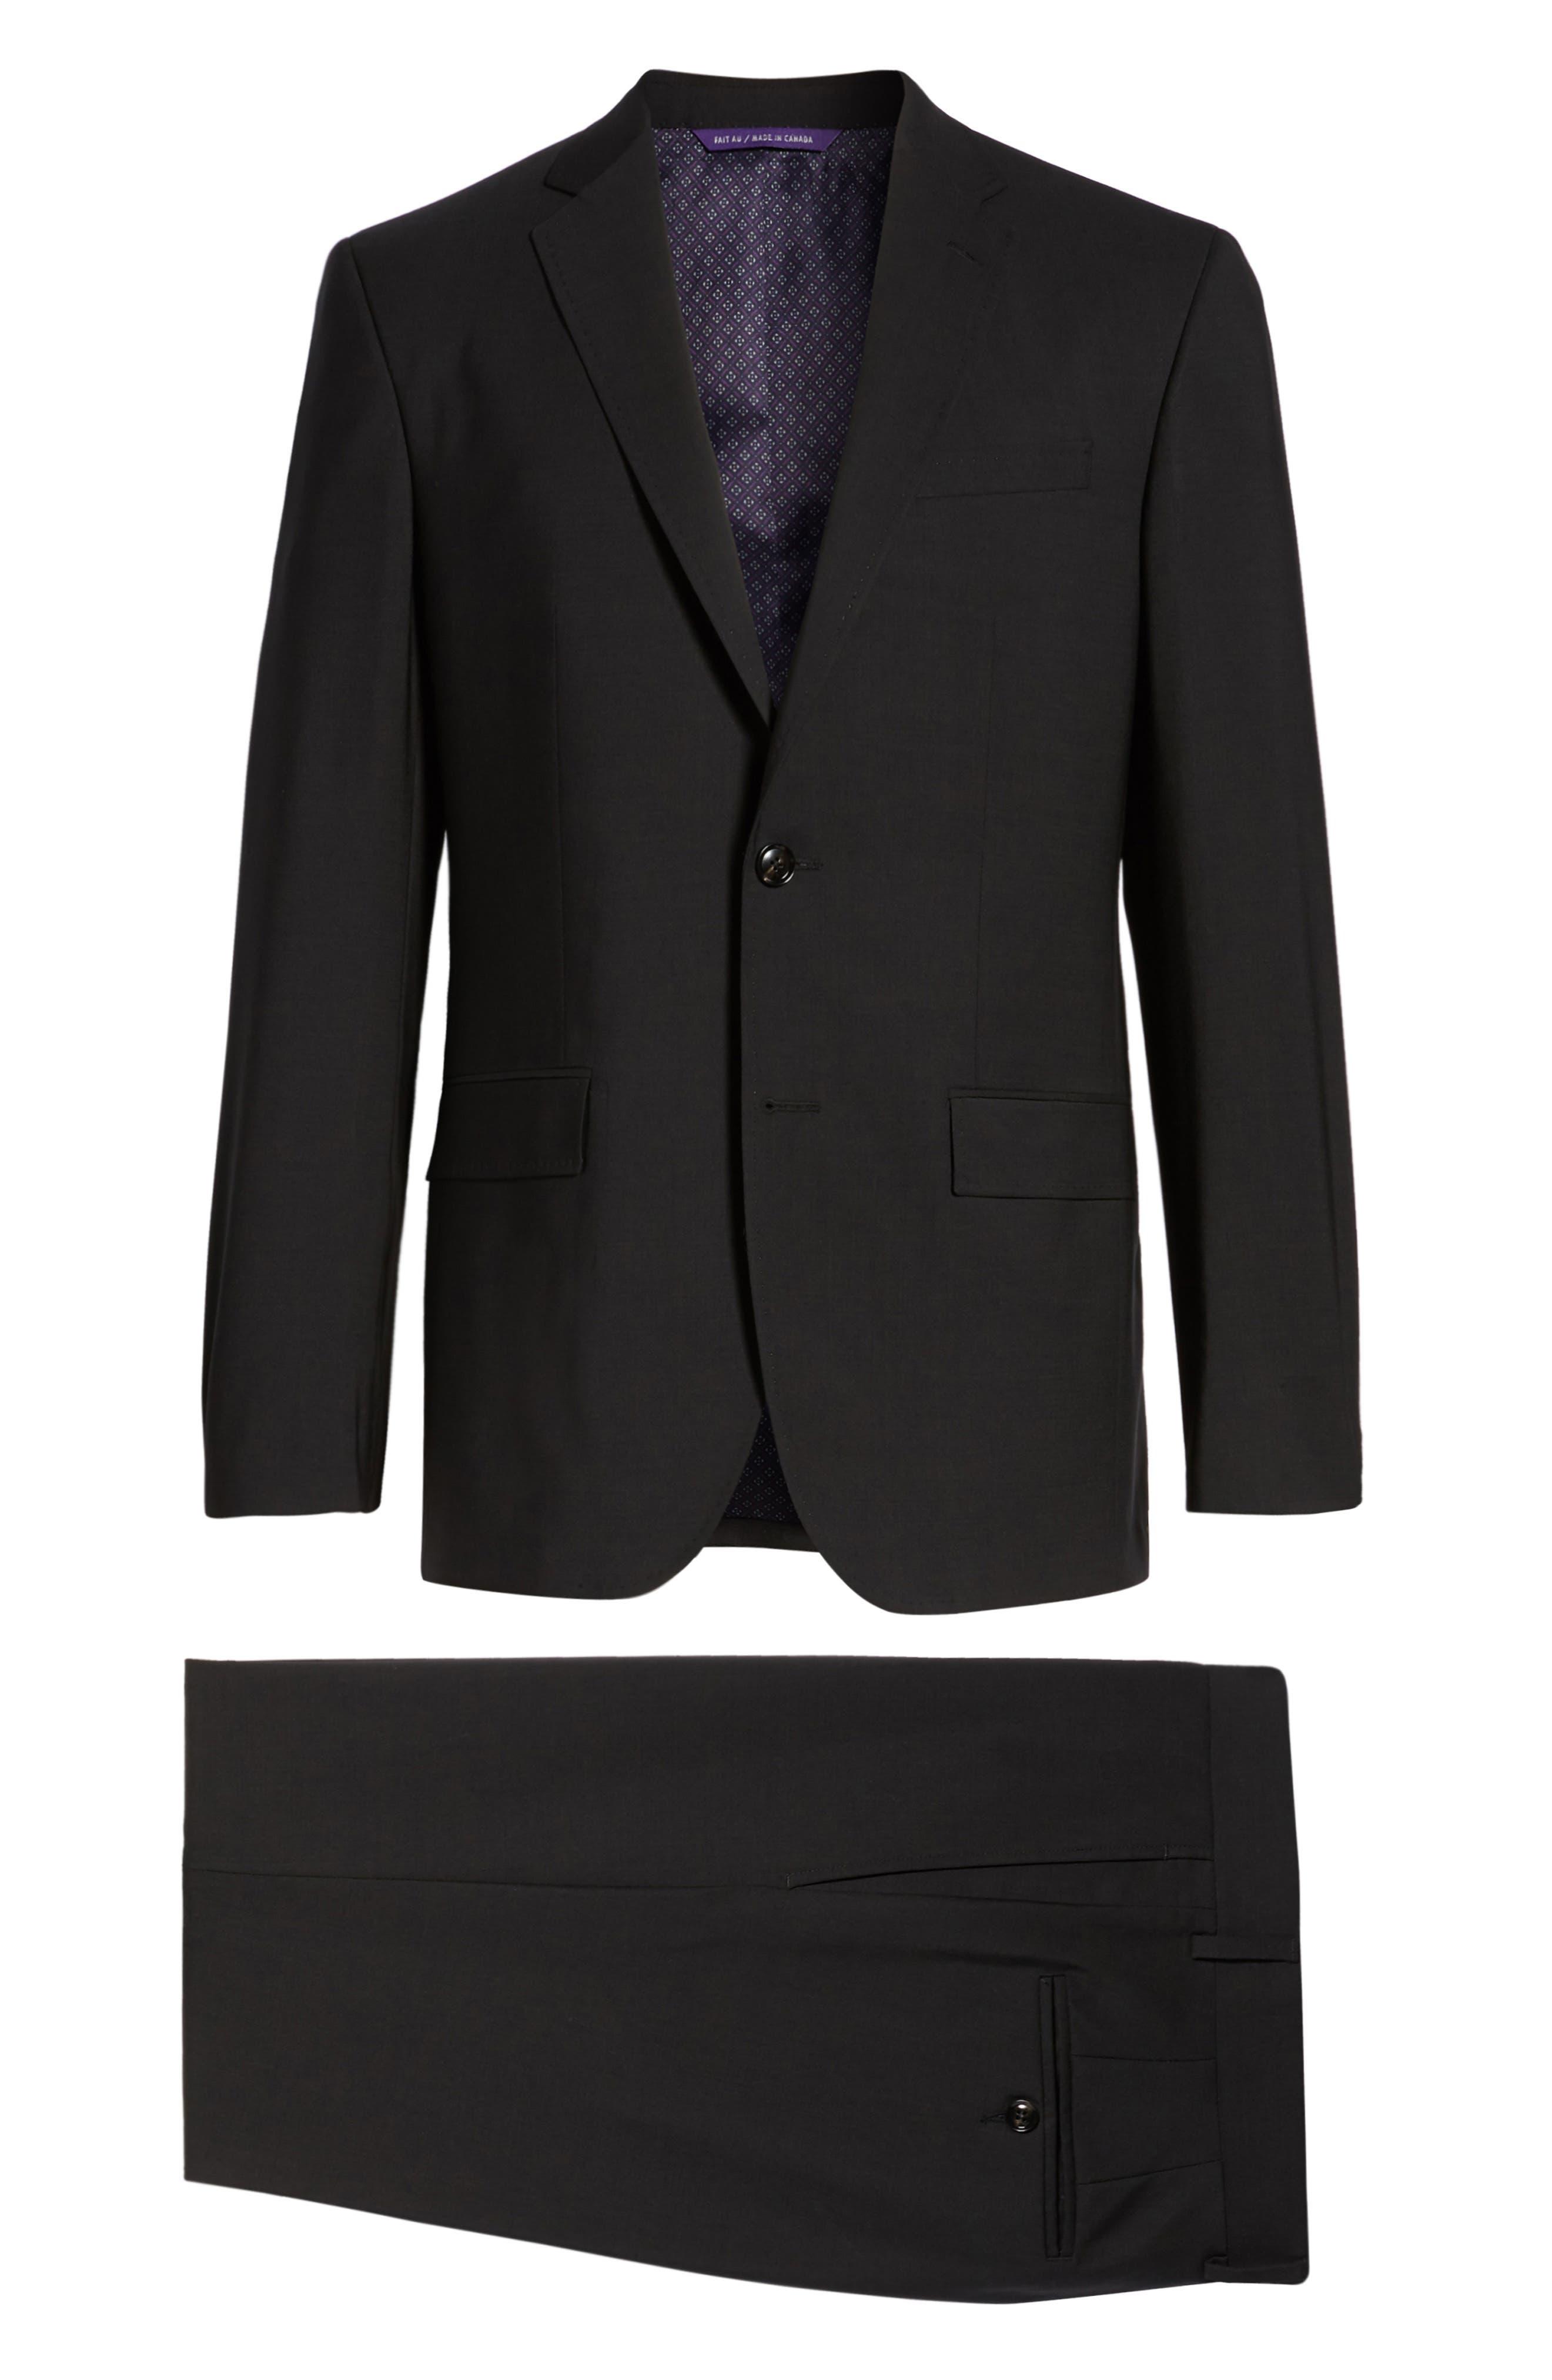 Jay Trim Fit Solid Wool Suit,                             Alternate thumbnail 8, color,                             Black